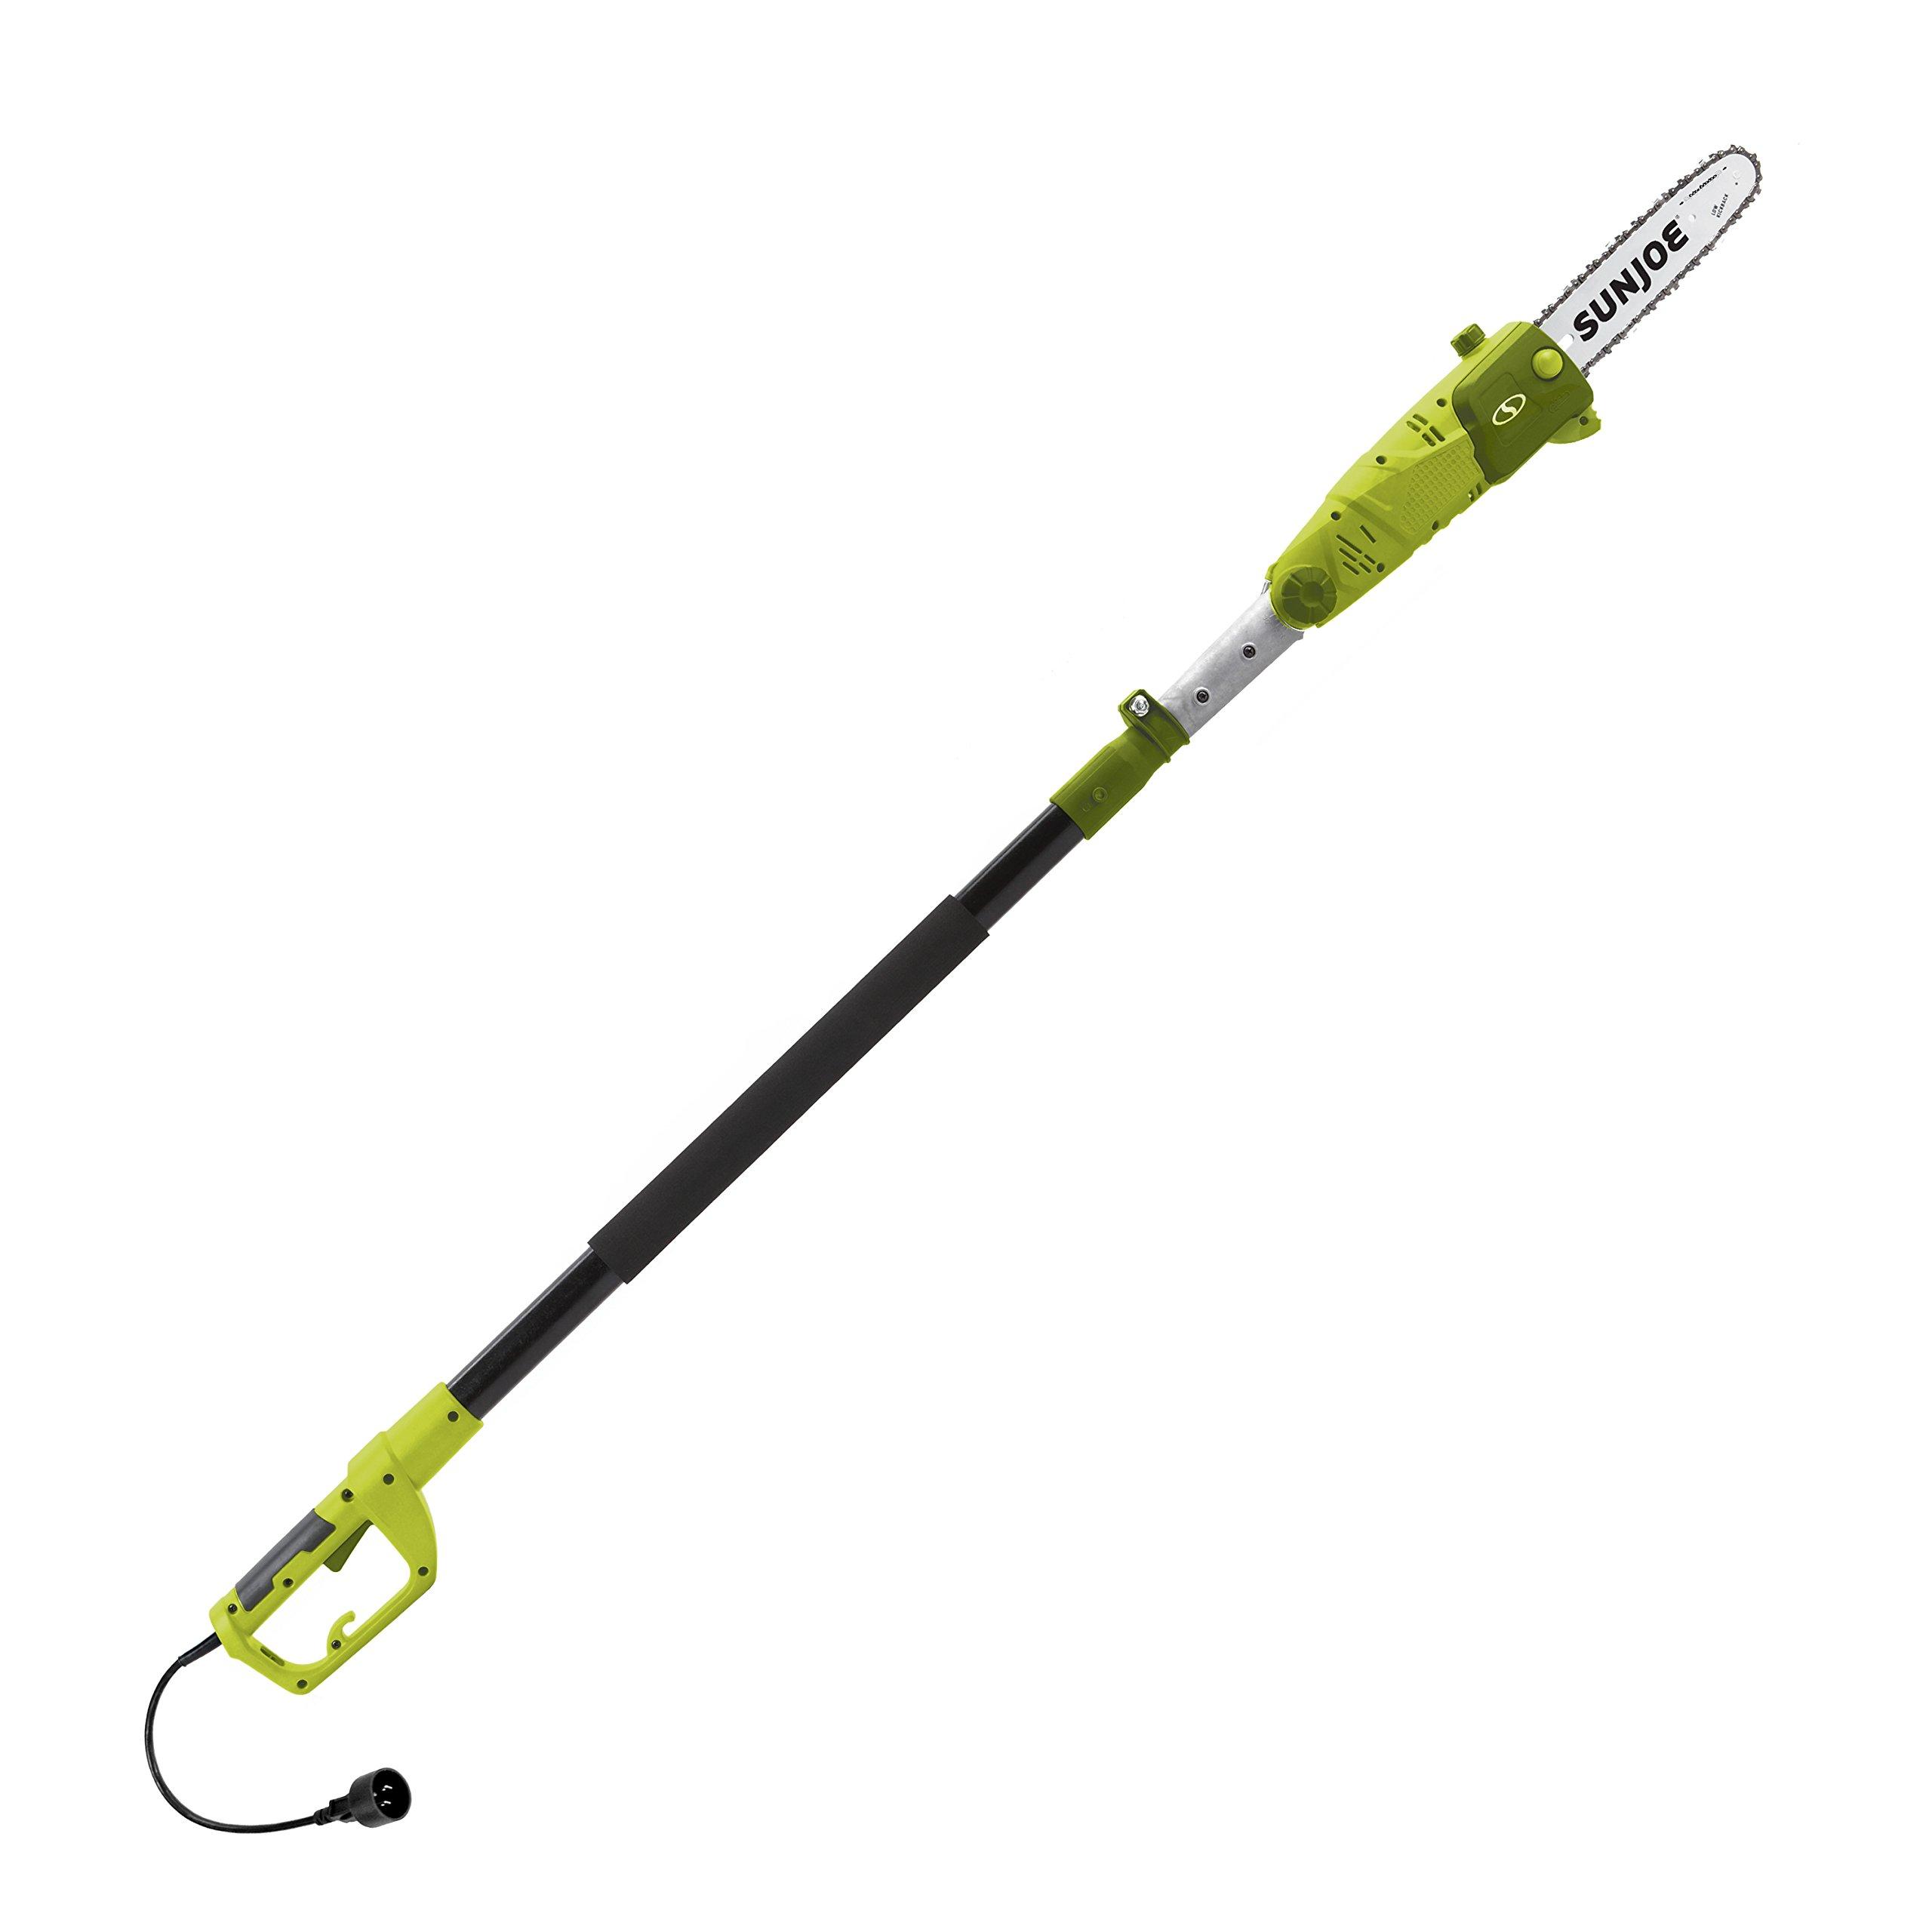 Sun Joe SWJ803E-RM 10'' 8-Amp Multi-Angle Telescopic Electric Pole Chain Saw, Green